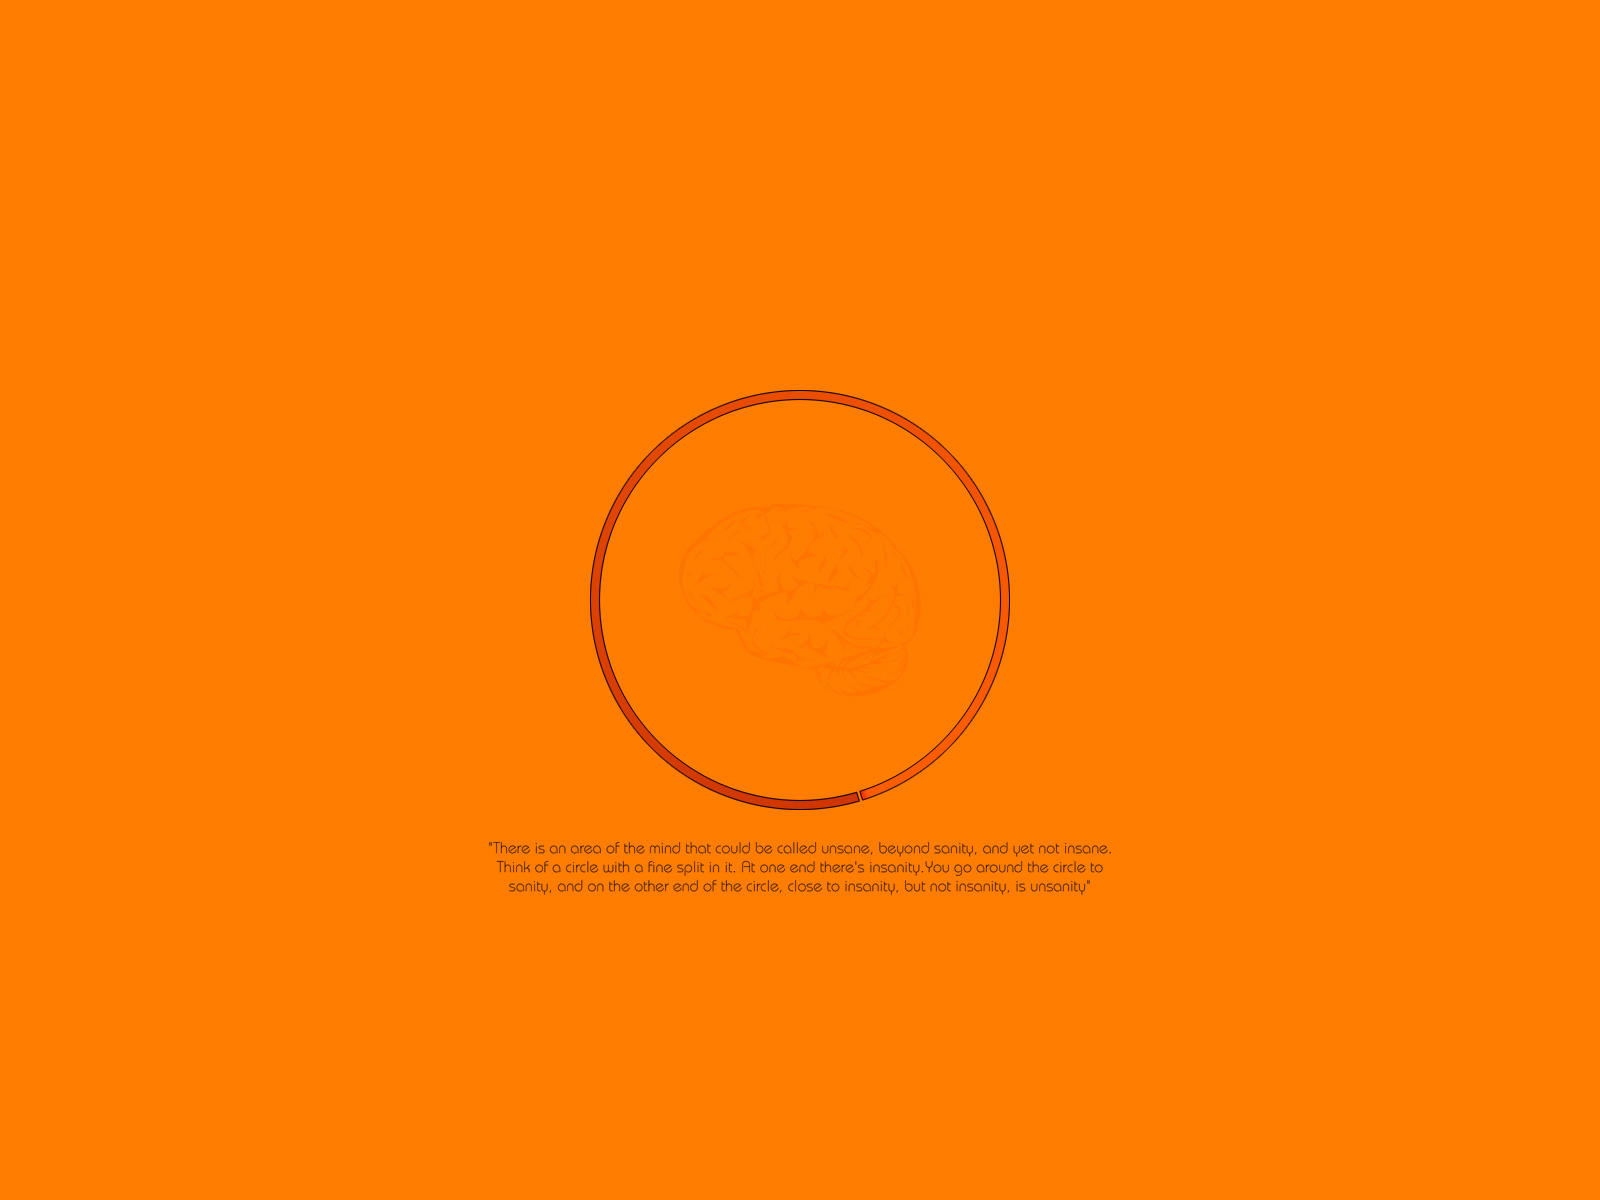 Unsane - Beyond Sanity by vipermd